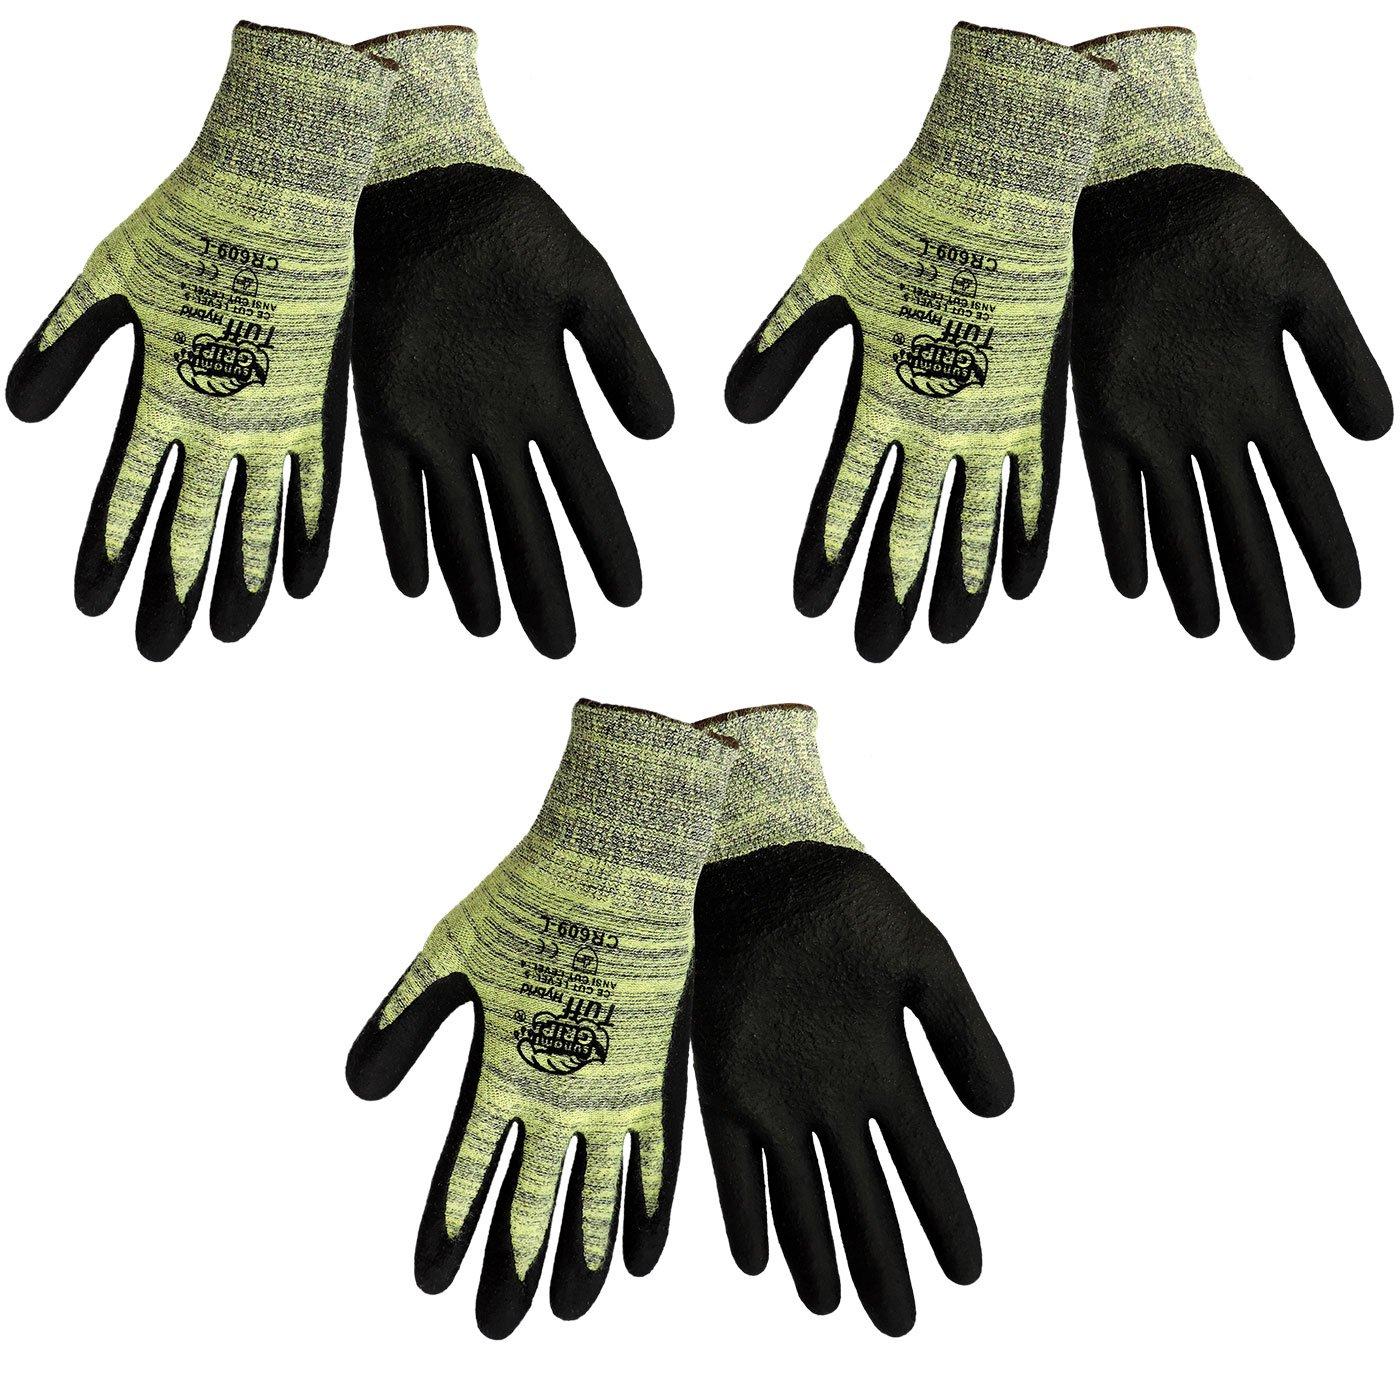 Tsunami Grip CR609 Tuff Hybrid Cut Resistant Nitrile Coated Work Glove Sizes S-XL, (3 Pair Pack) (Large)